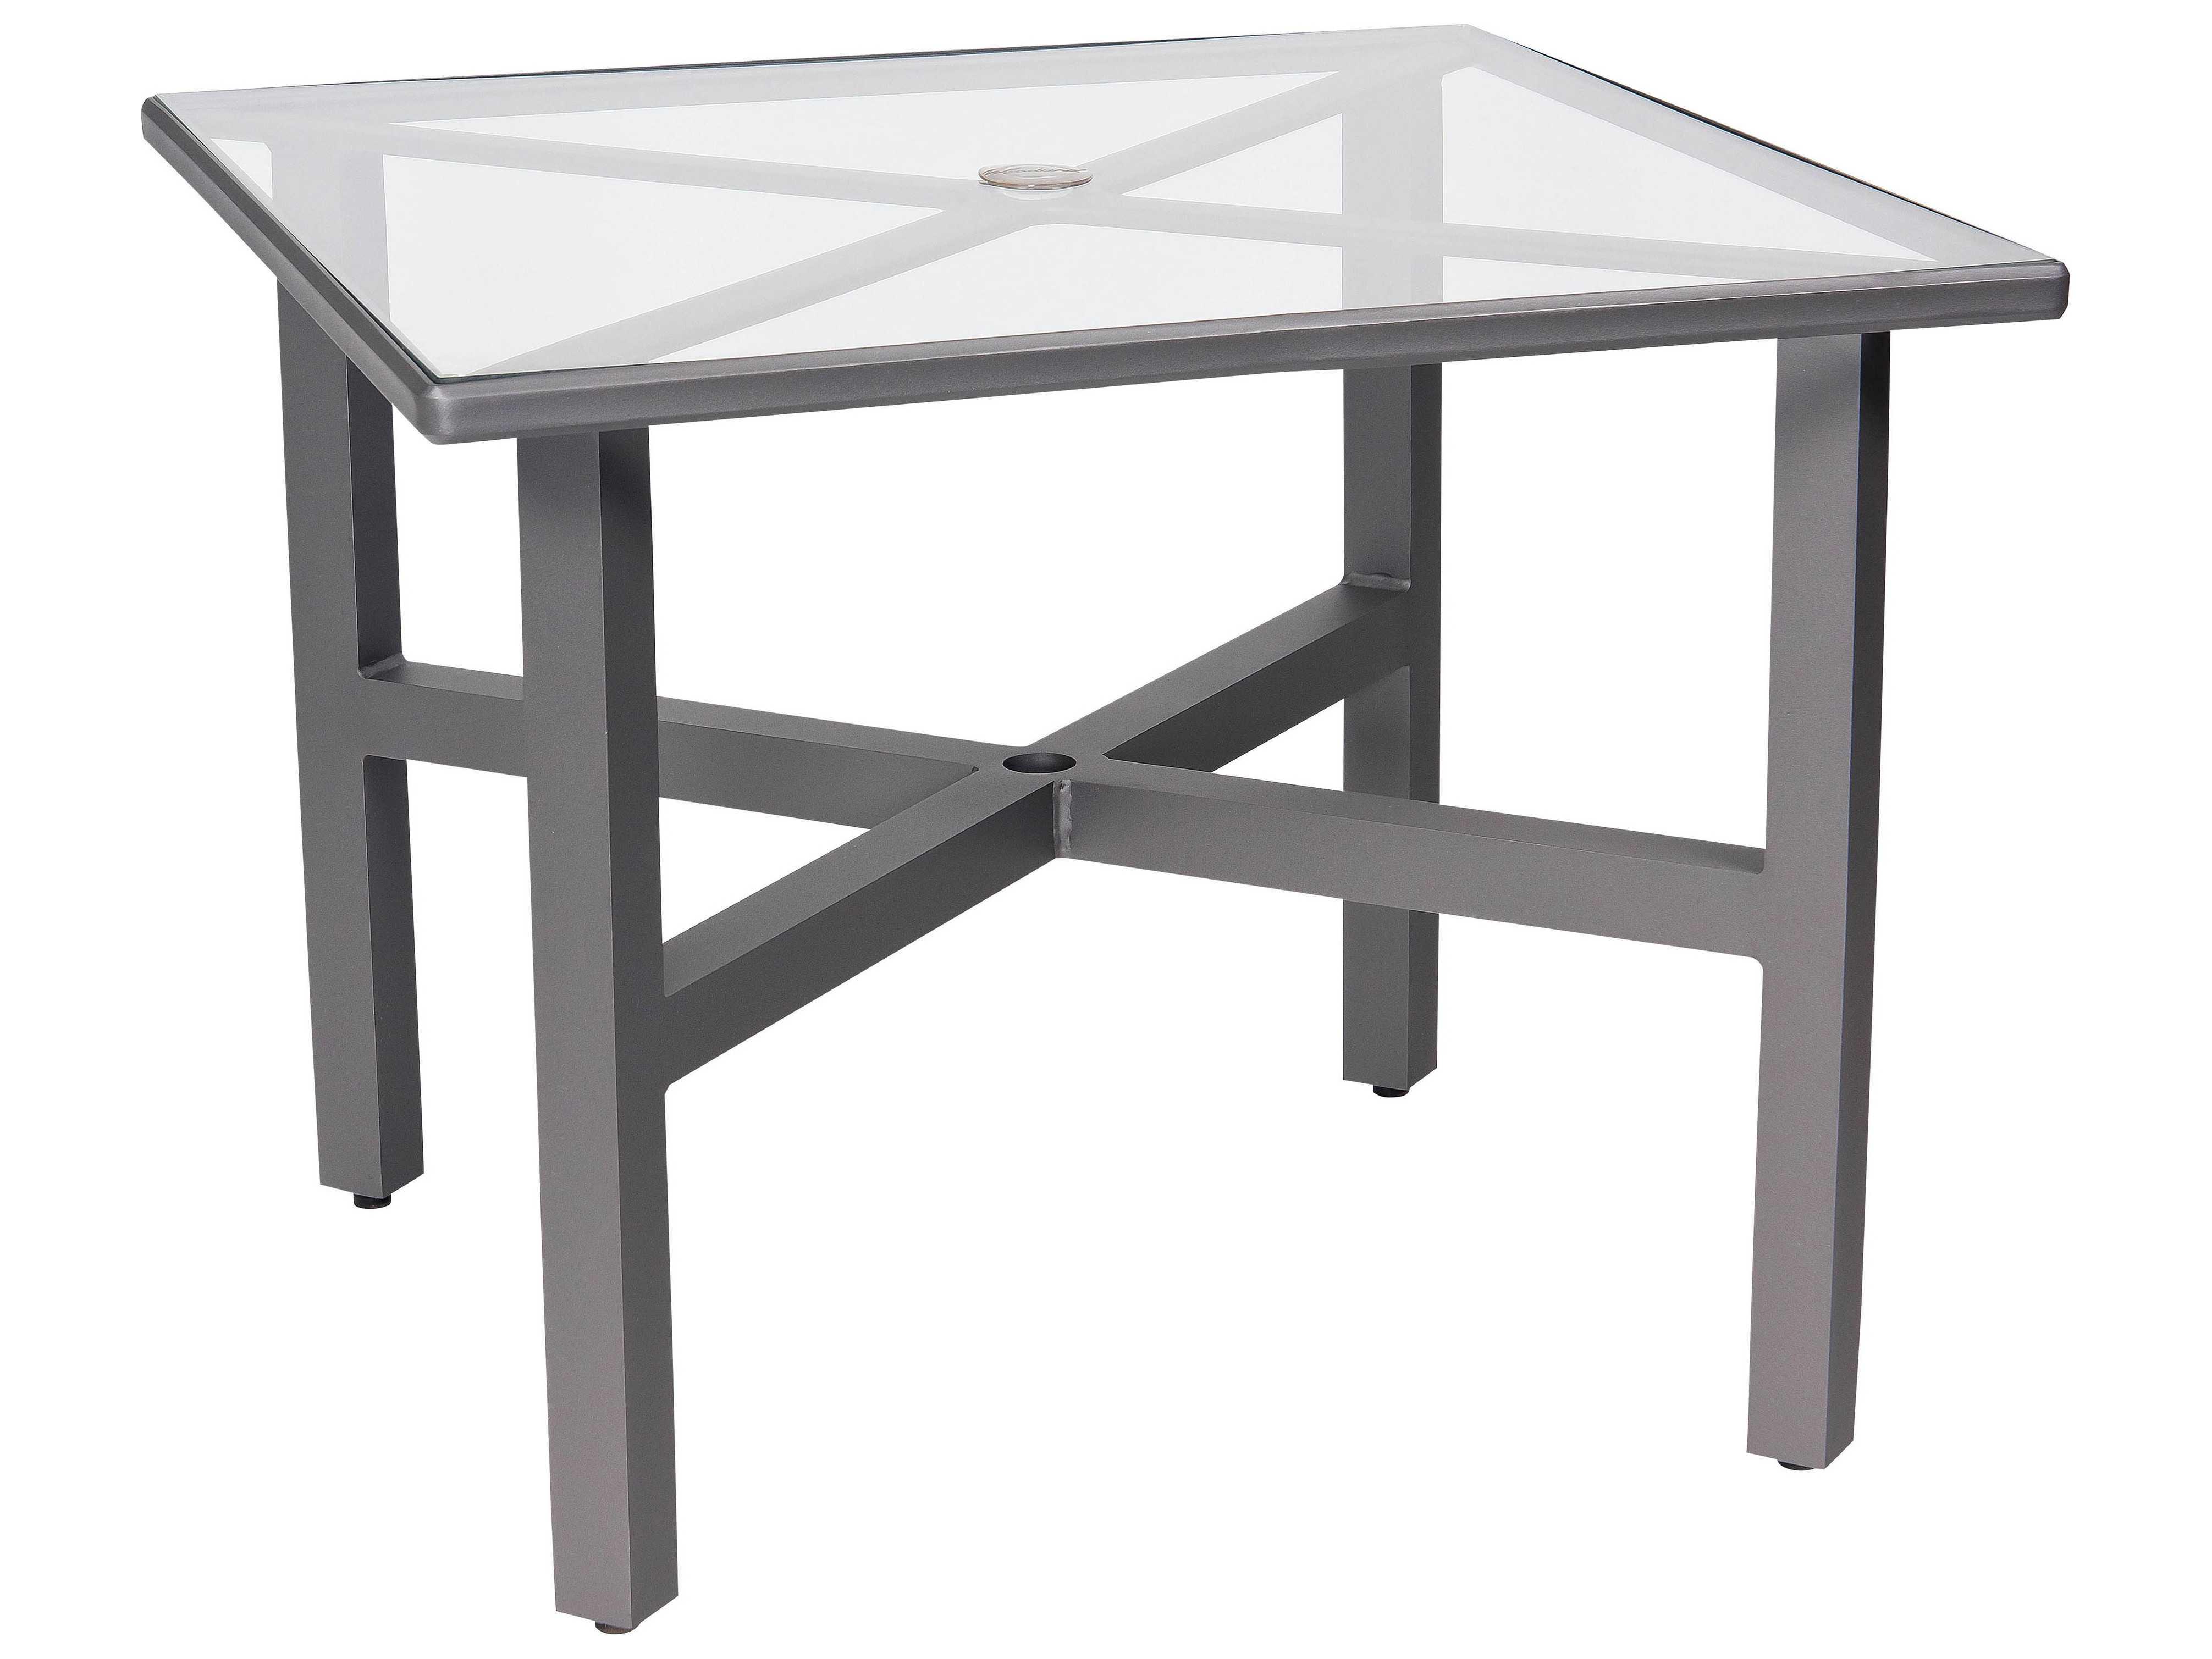 Woodard elite aluminum 36 square acrylic dining table with - Aluminium picnic table with umbrella ...